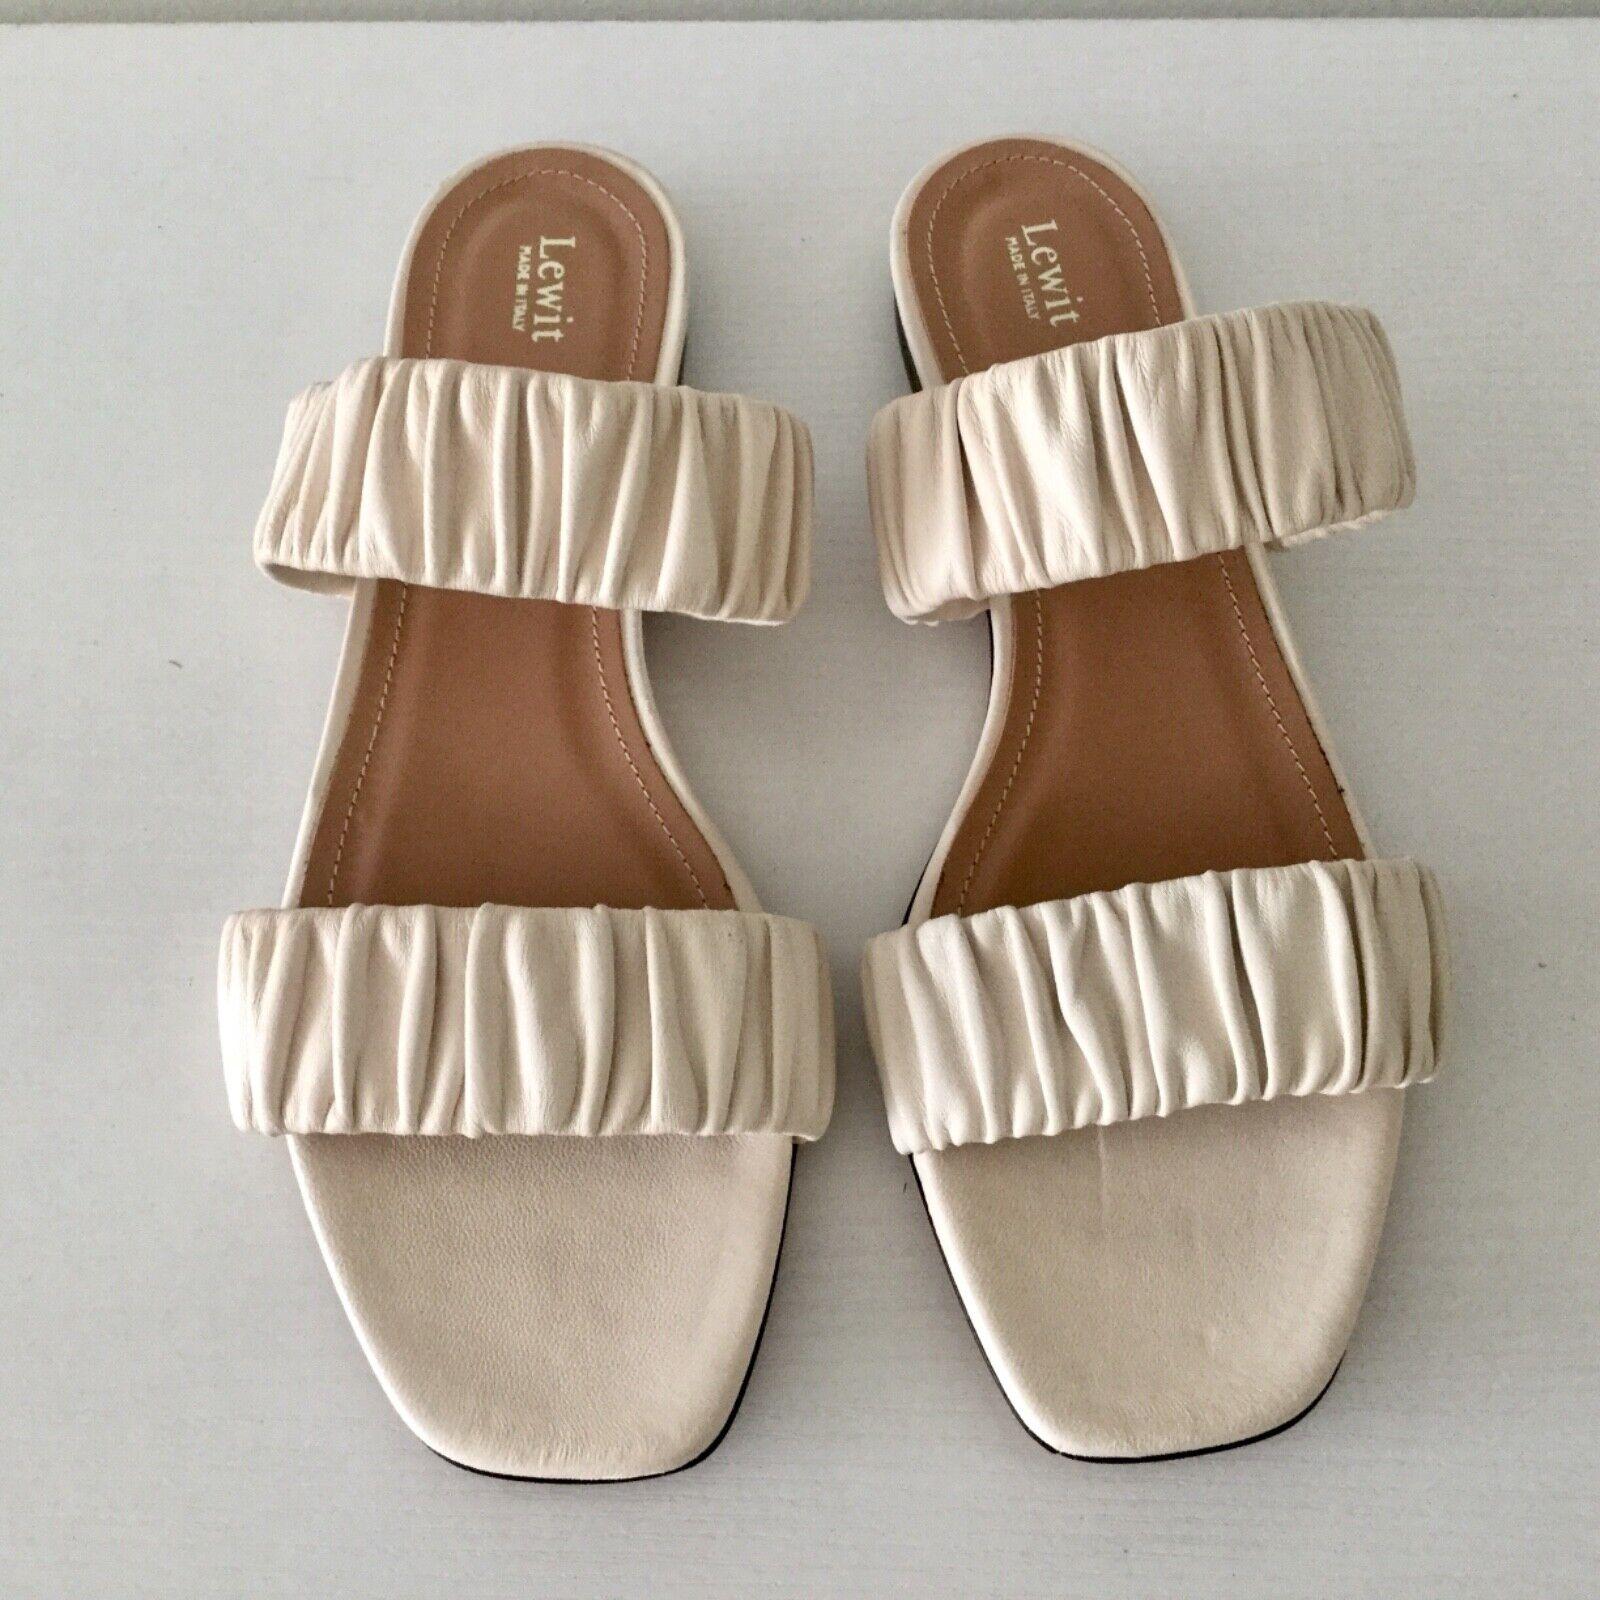 NEW Lewit Elena Ruched Bone Leather Slide Sandal Size 39